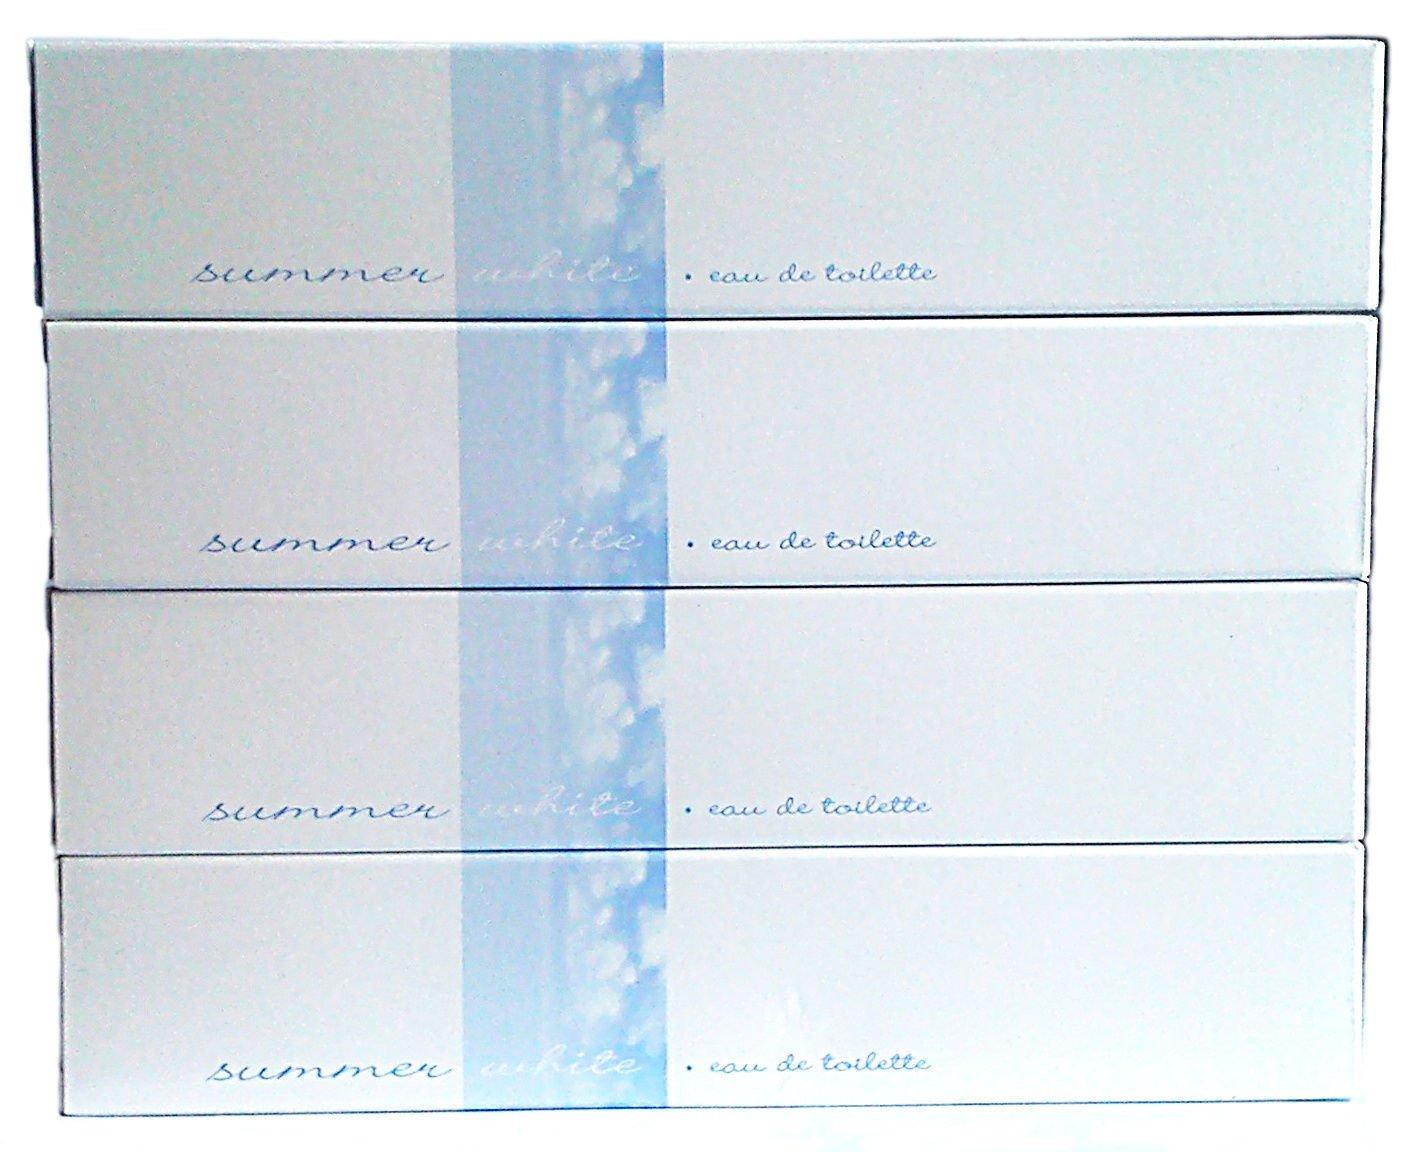 4 x AVON Summer White Eau de Toilette 50ml - 1.7fl.oz. SET !